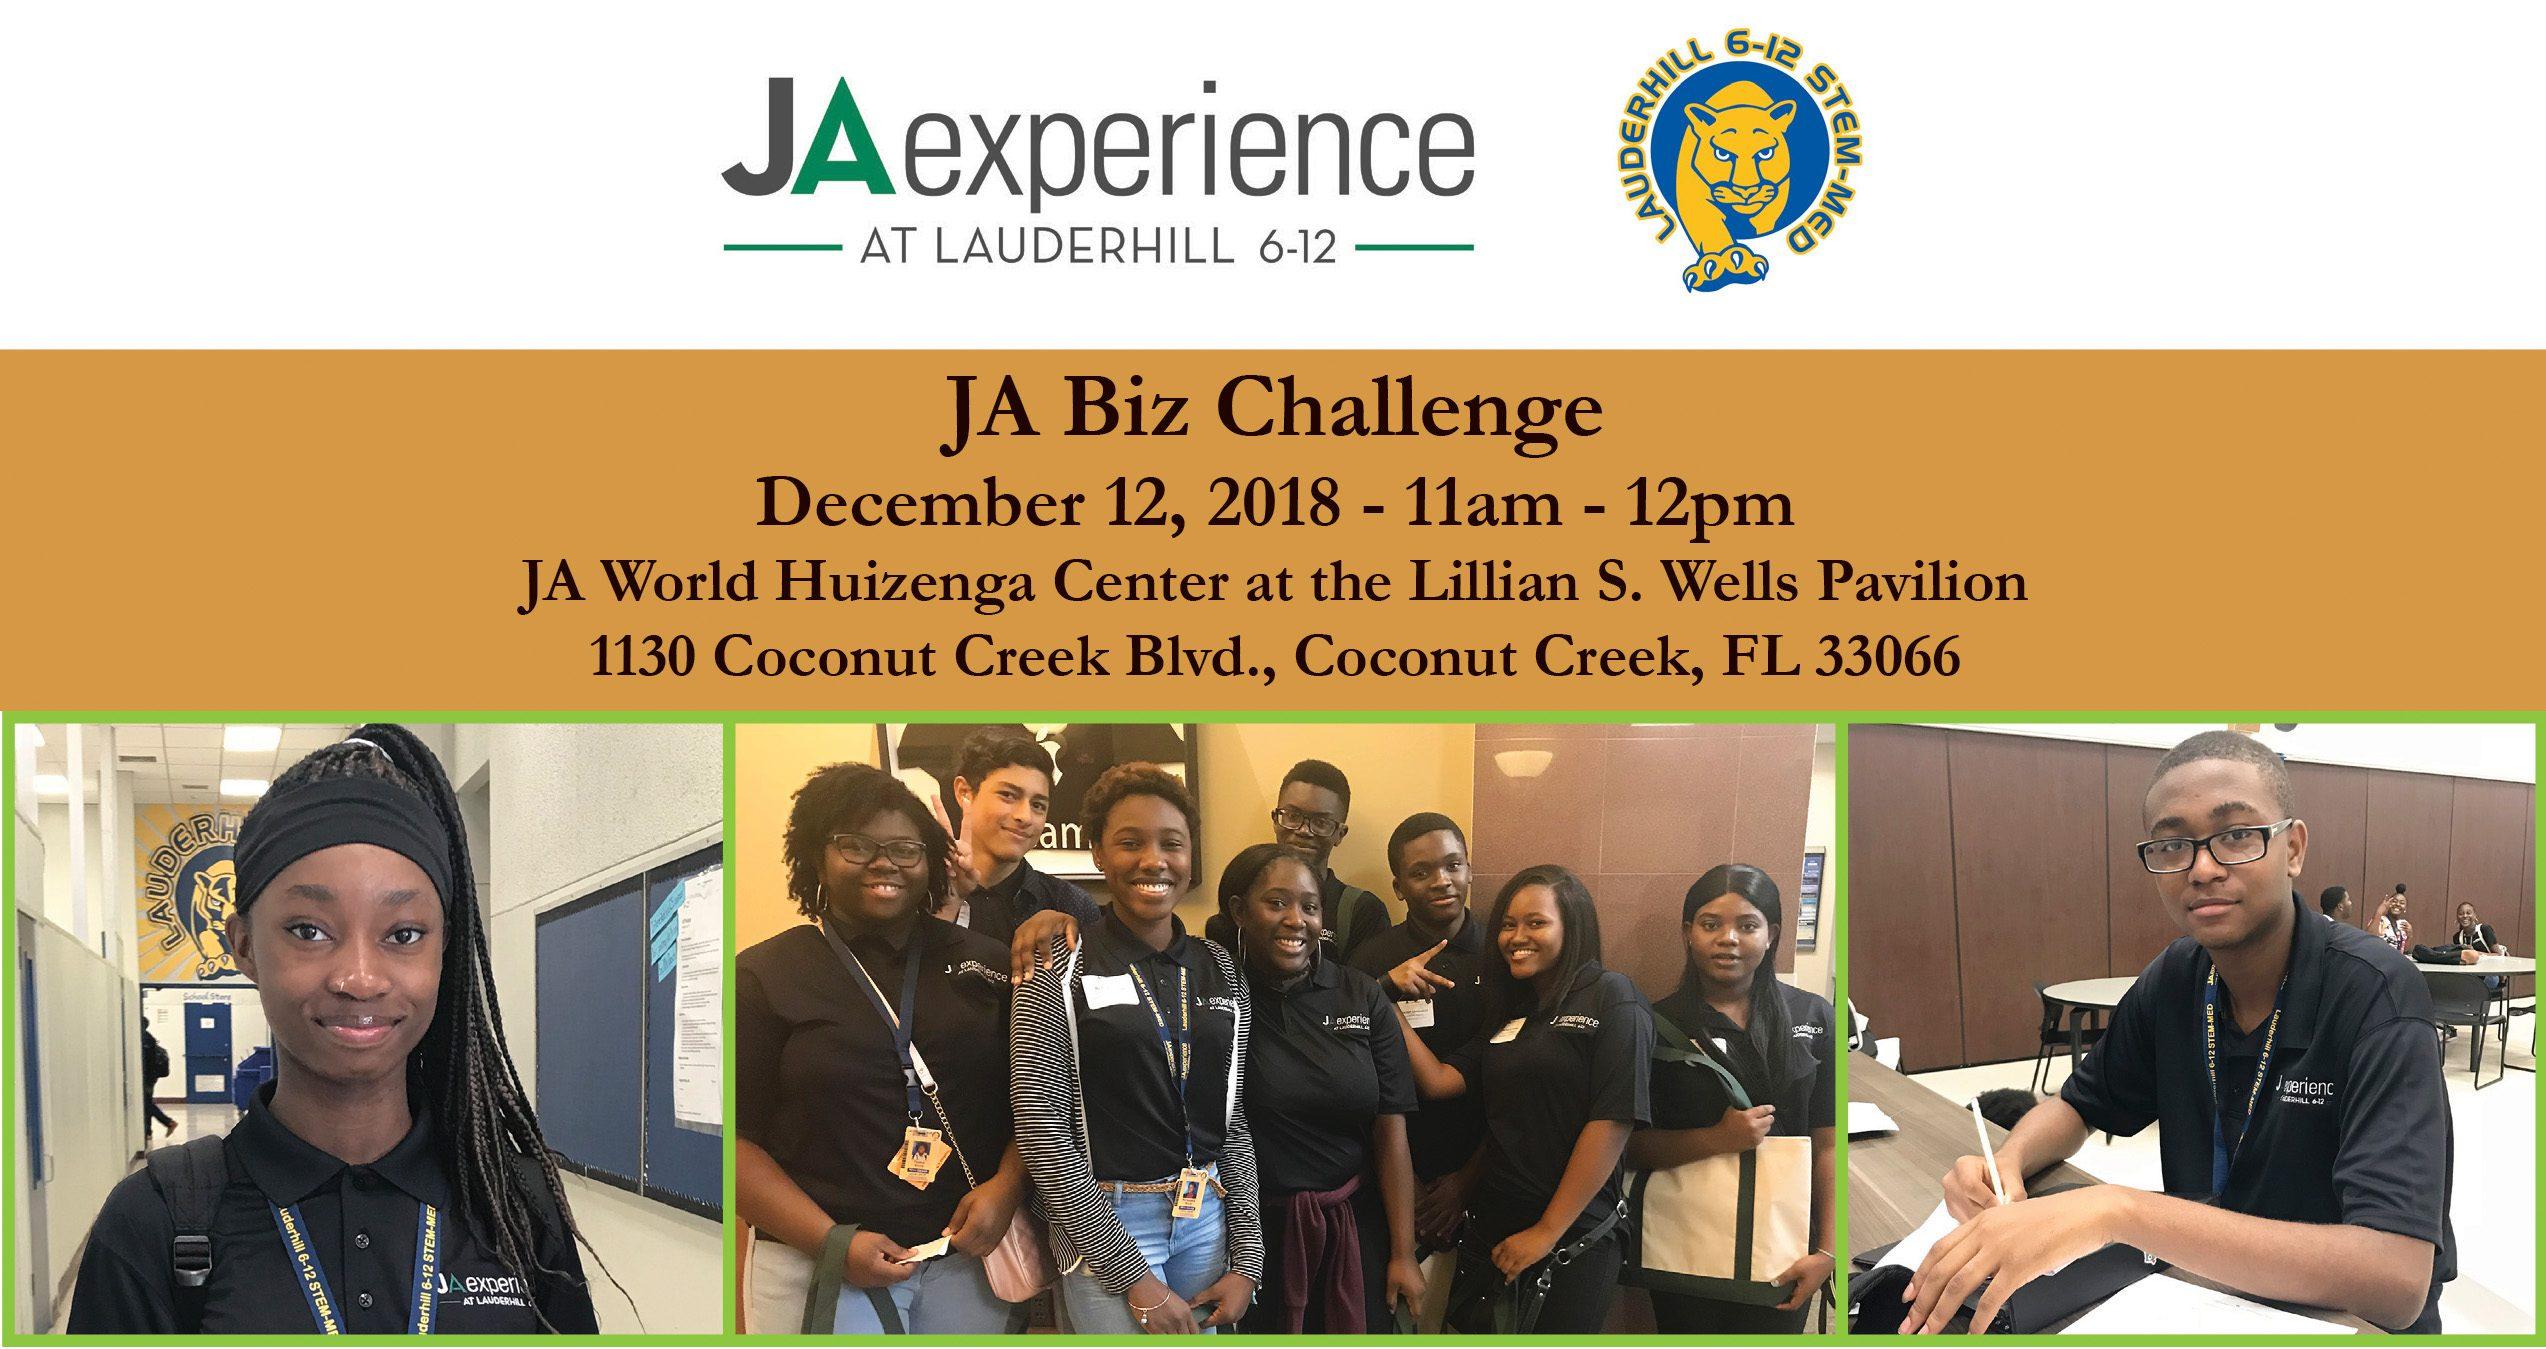 JA Experience Announces JA Biz Challenge